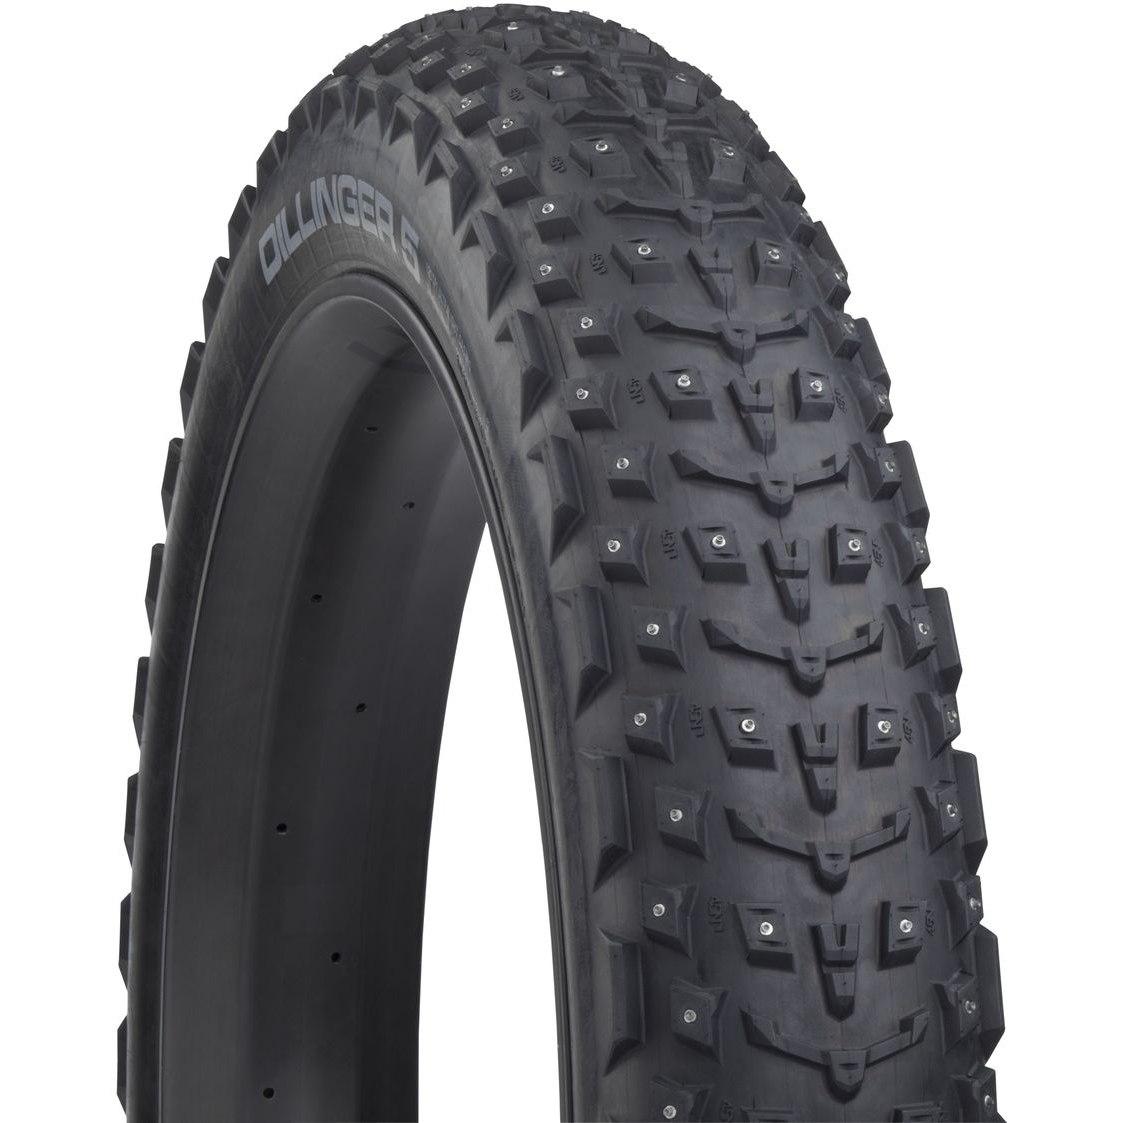 Imagen de 45NRTH Dillinger 5 Fatbike Folding Tire - 252 Studs - Tubeless Ready - 27.5x4.5 Inch - 120TPI